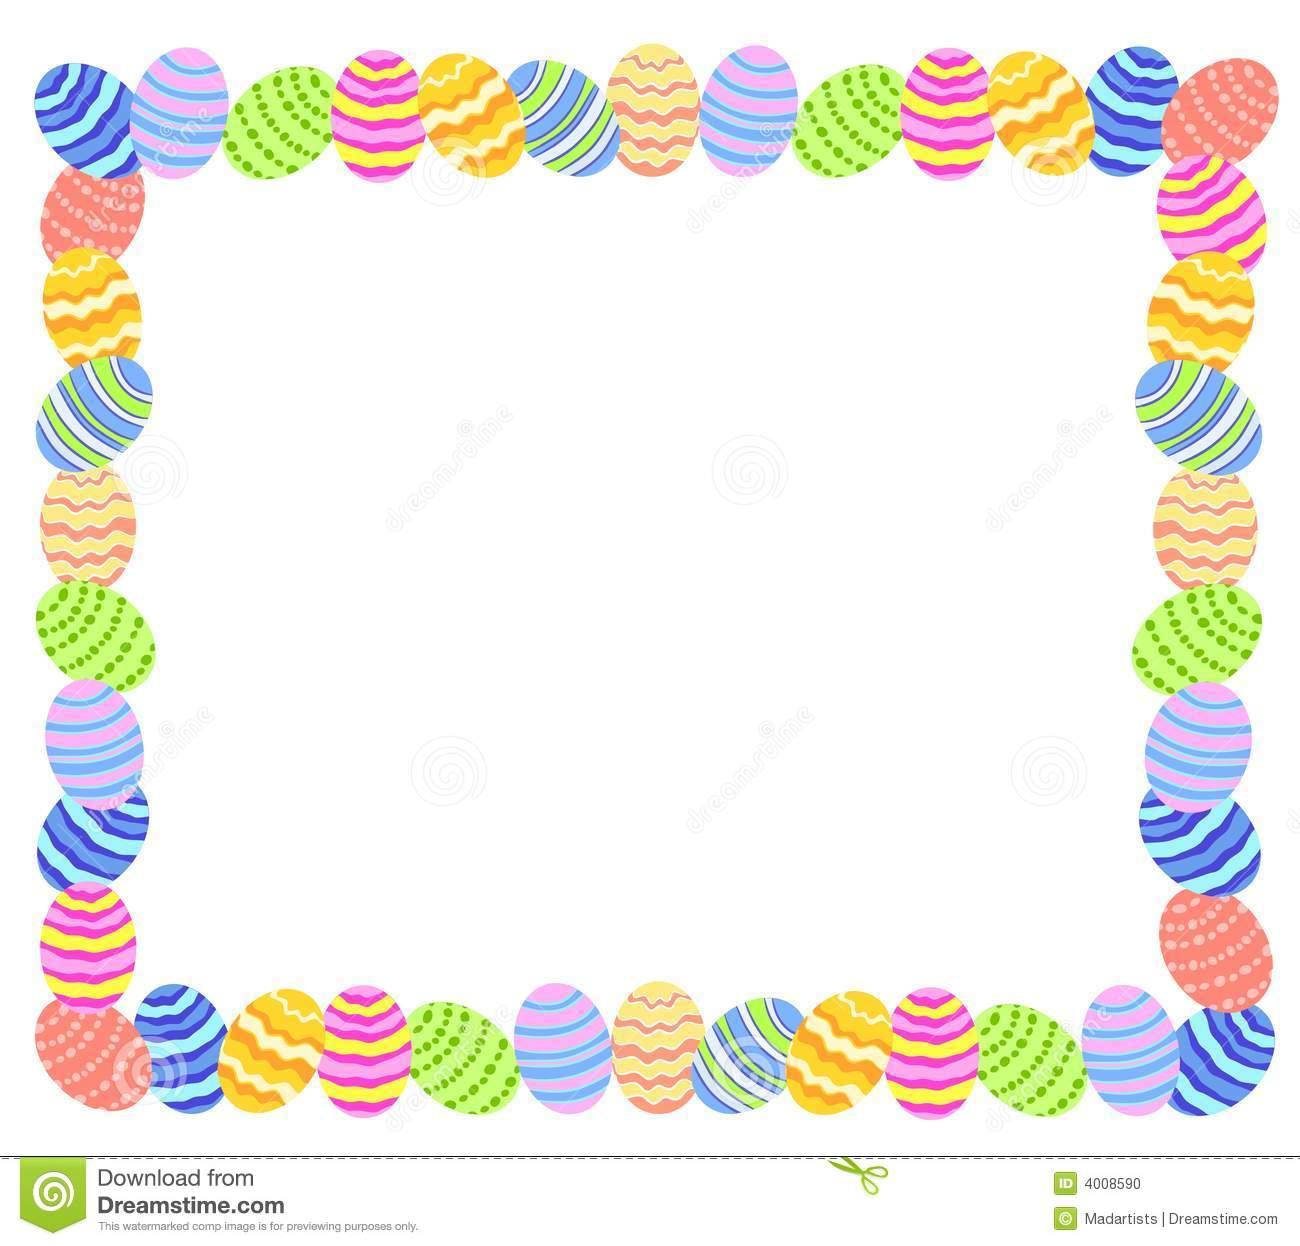 Easter egg clipart border transparent Easter egg clip art border - ClipartFest transparent